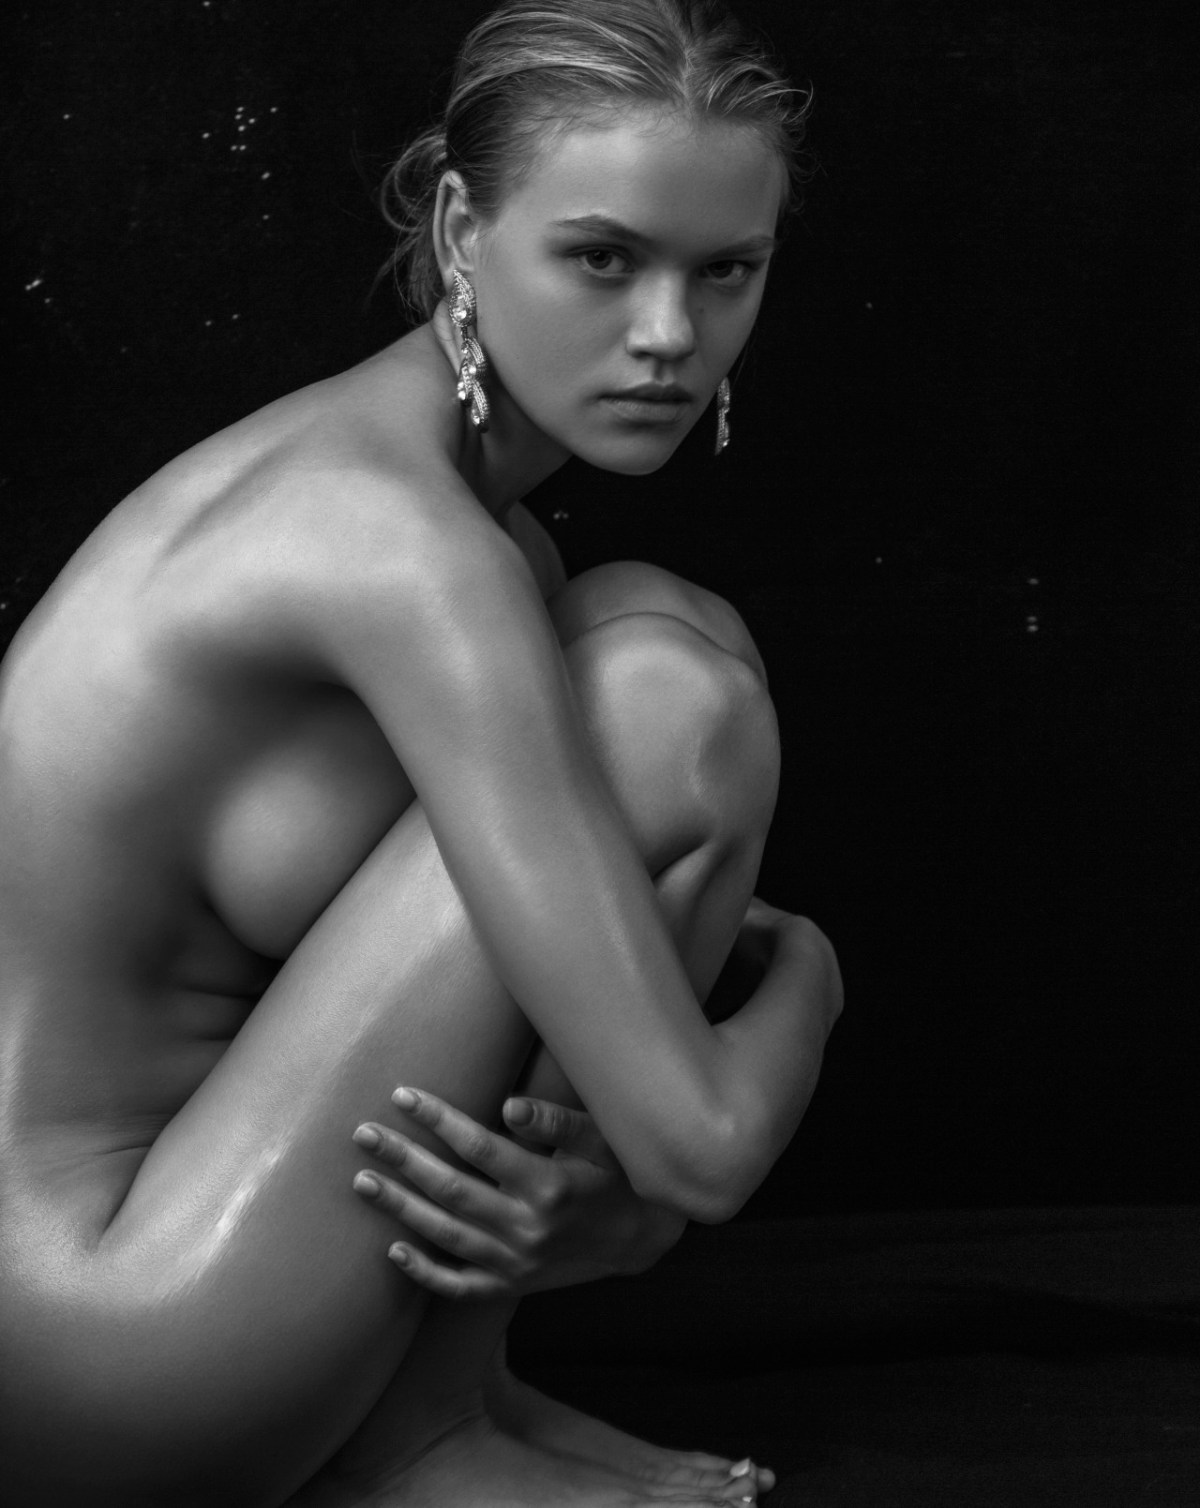 Valentina-Shemelina-by-Maxim-Gagarin